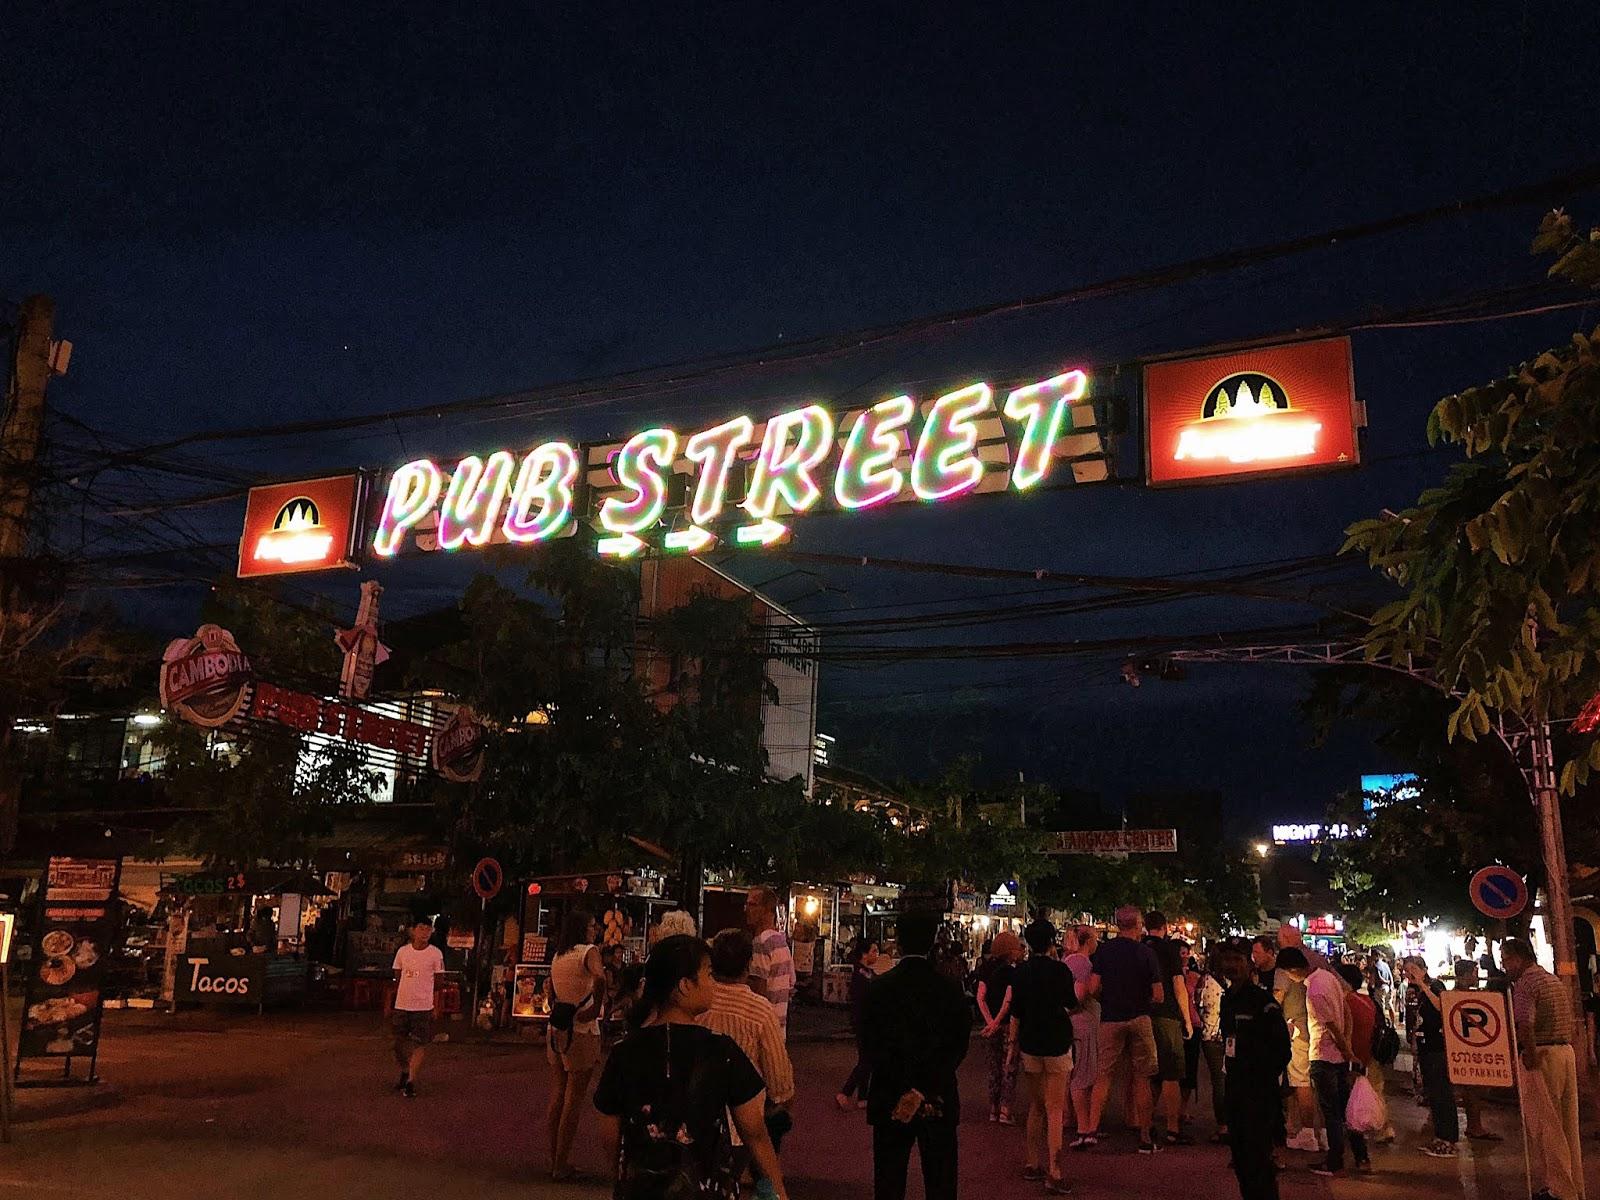 Pub street sign